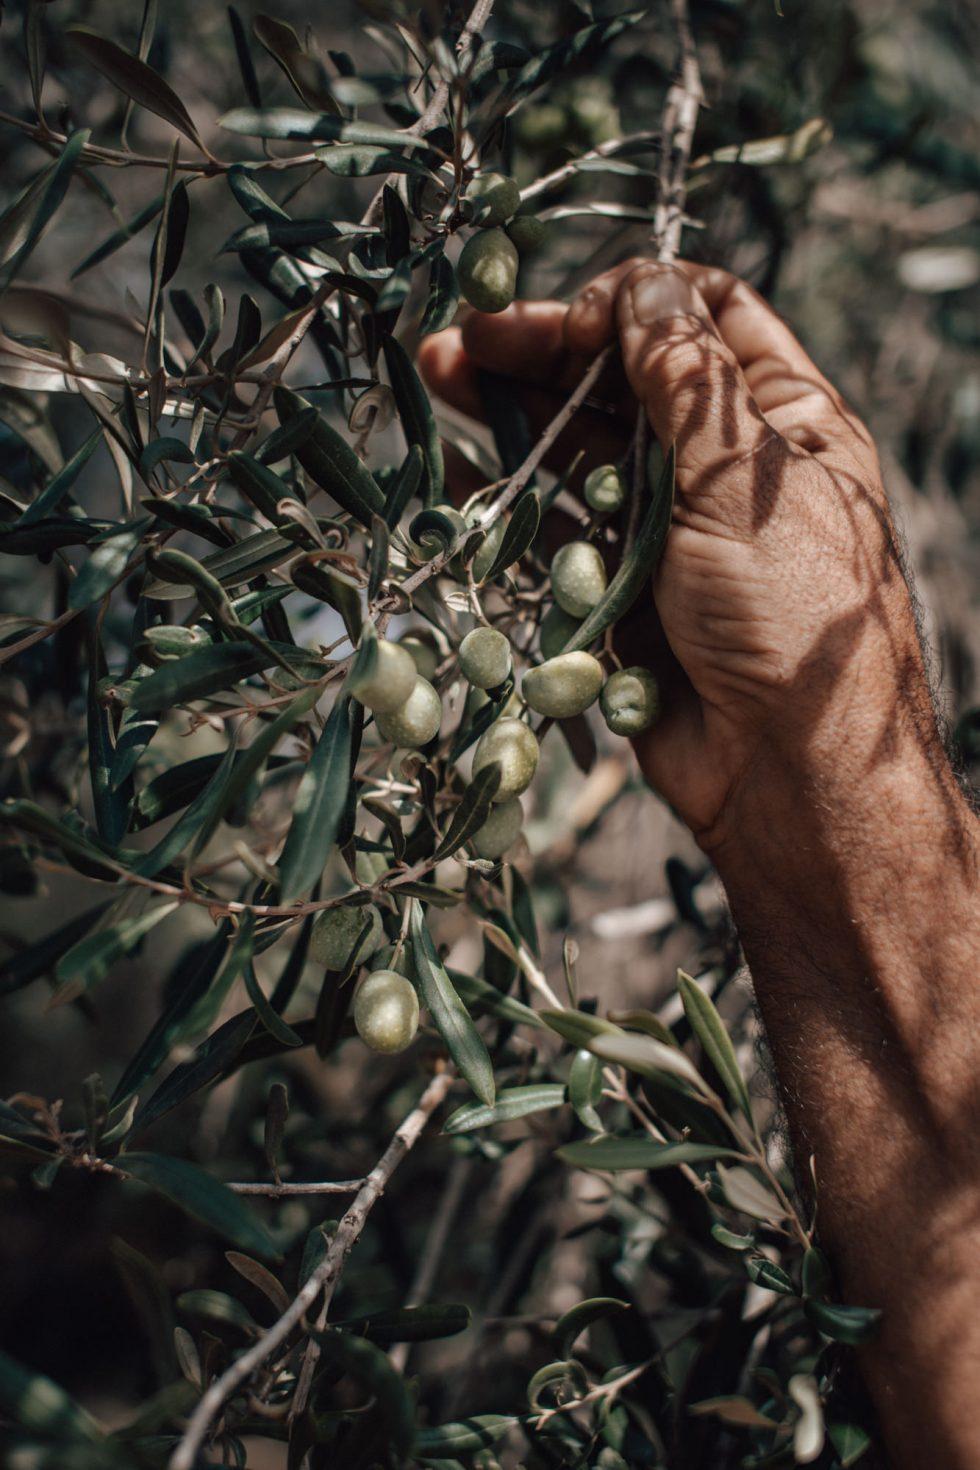 malta-travel-sustainable-farm-lifestyle-photographer-laura-g-diaz-2